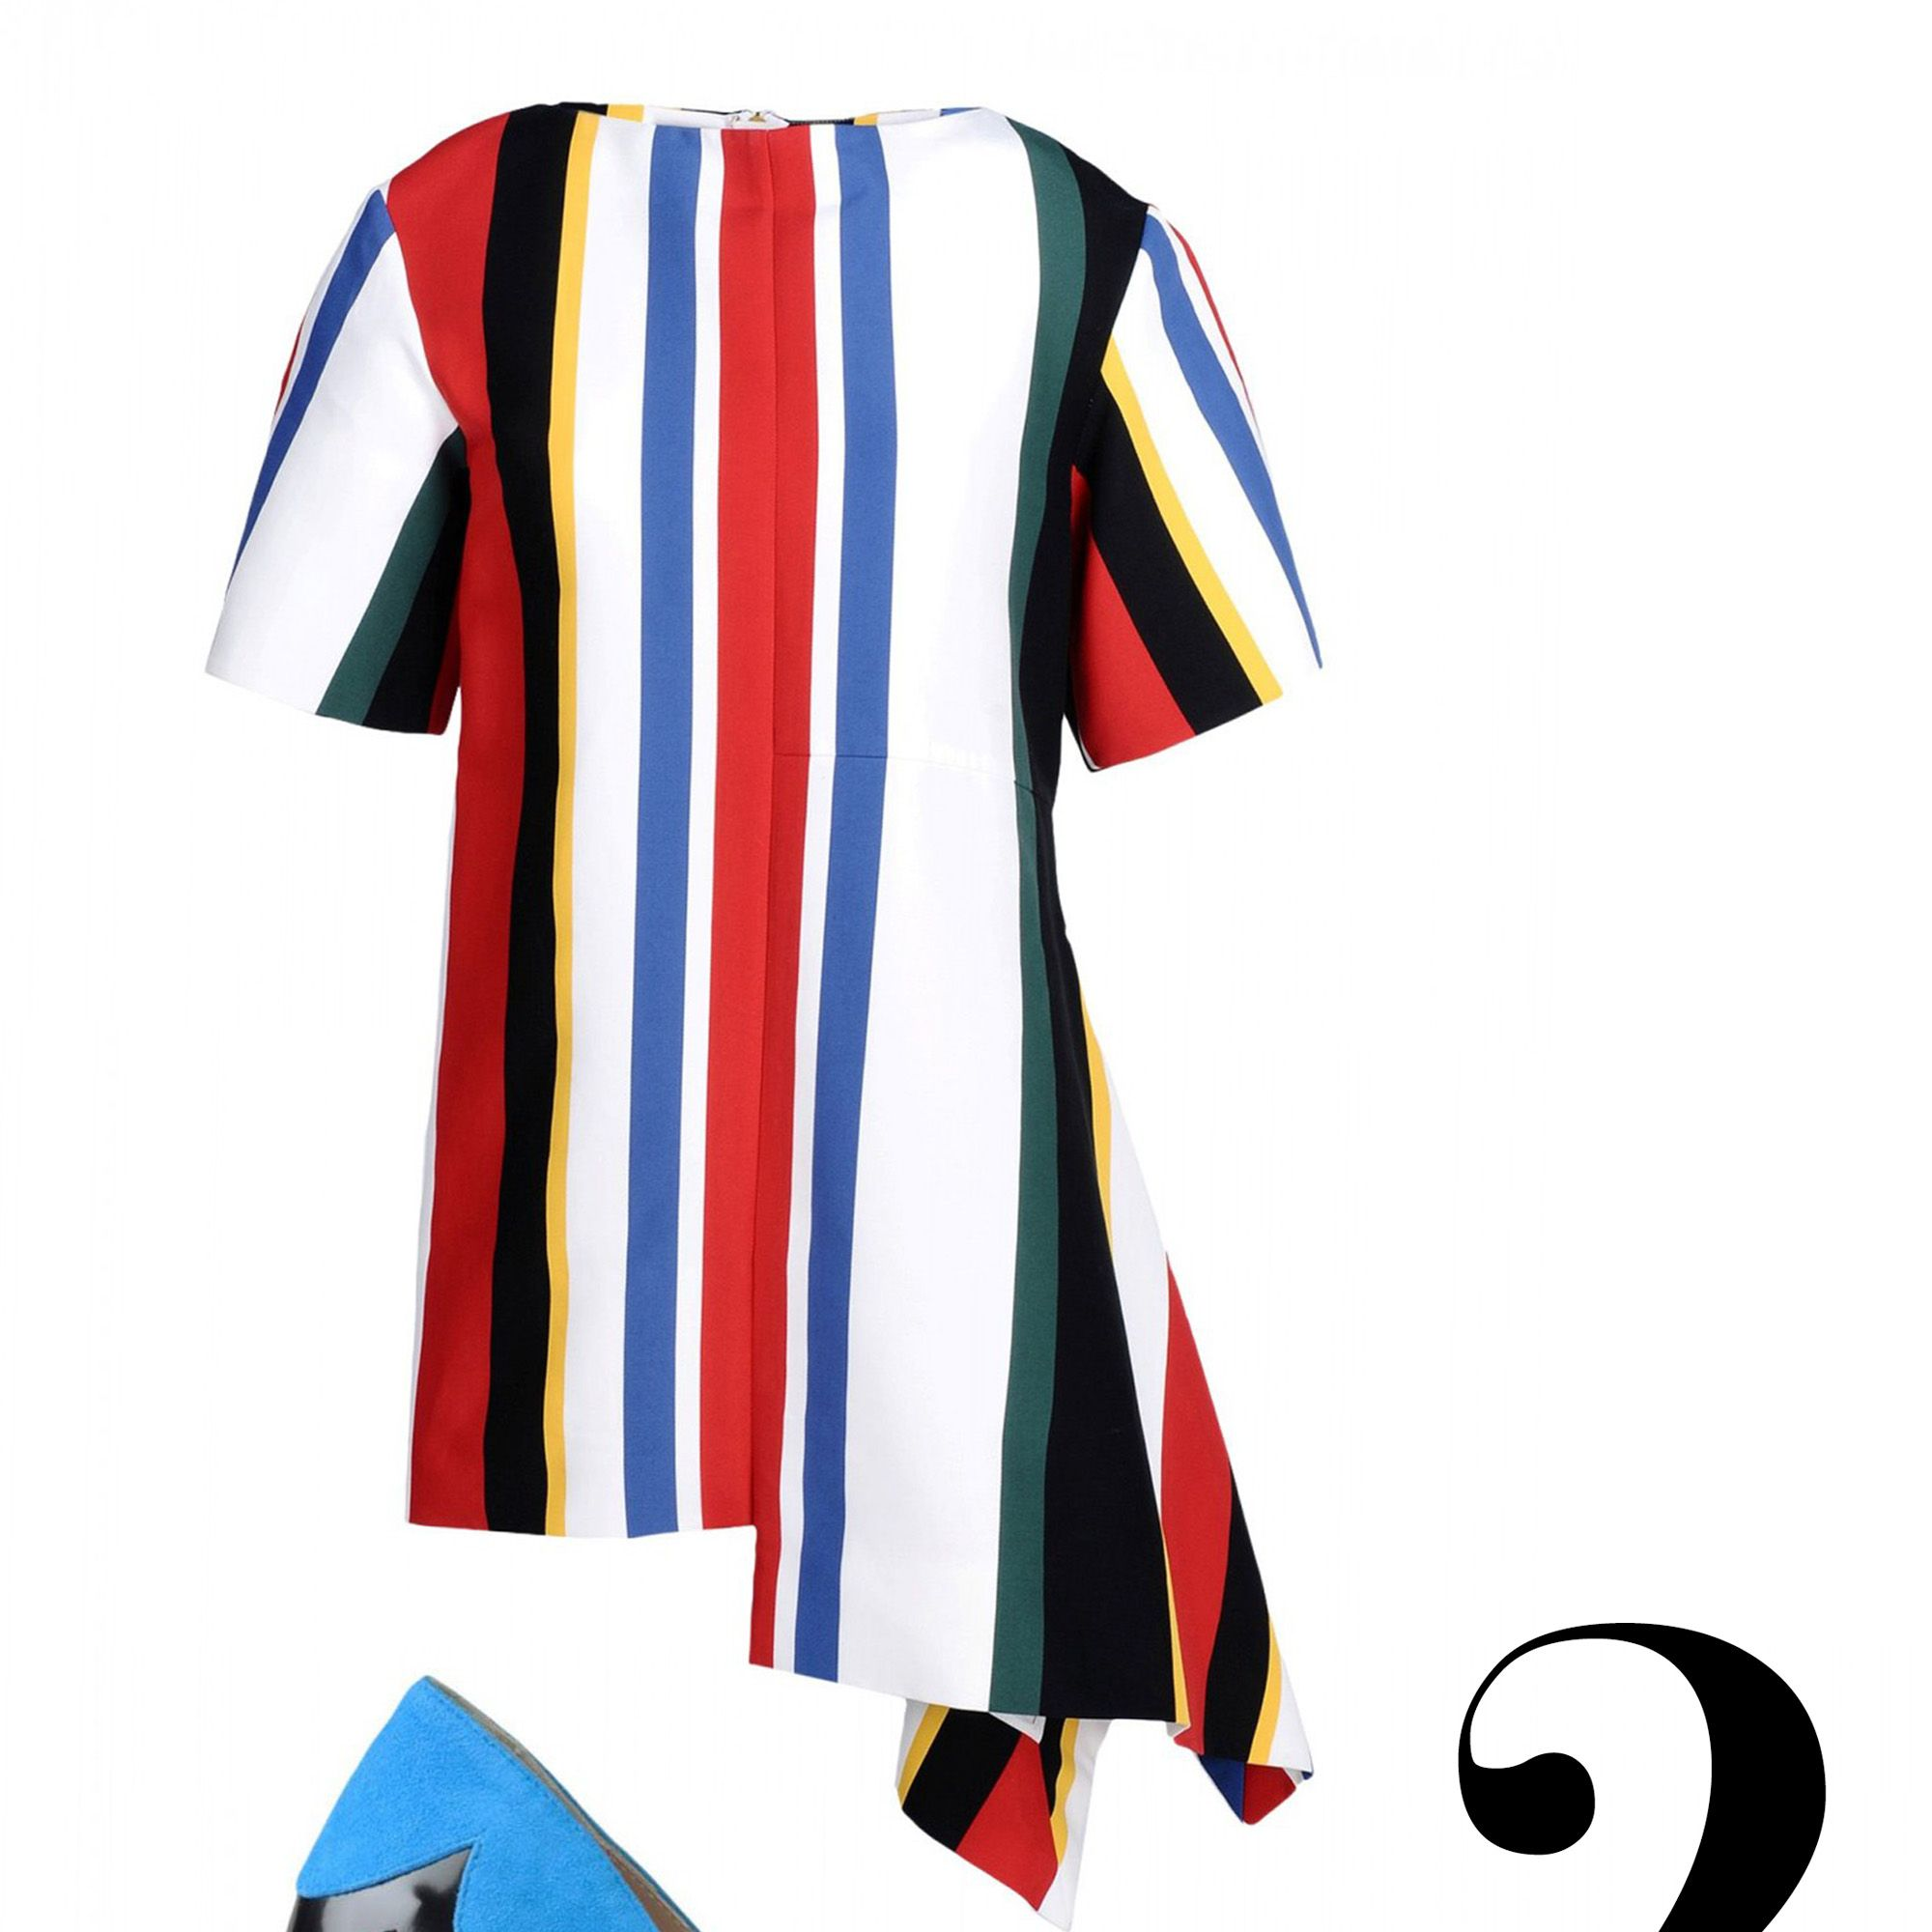 "<em>Marni dress, $1,538, <a href=""http://shop.harpersbazaar.com/designers/marni/stripe-staggered-hem-dress/"" target=""_blank"">shopBAZAAR.com</a>&#x3B; Paul Andrew pump, $895, <a href=""http://shop.harpersbazaar.com/designers/paul-andrew/suede-patent-striped-pump/"" target=""_blank"">shopBAZAAR.com</a>.</em>"